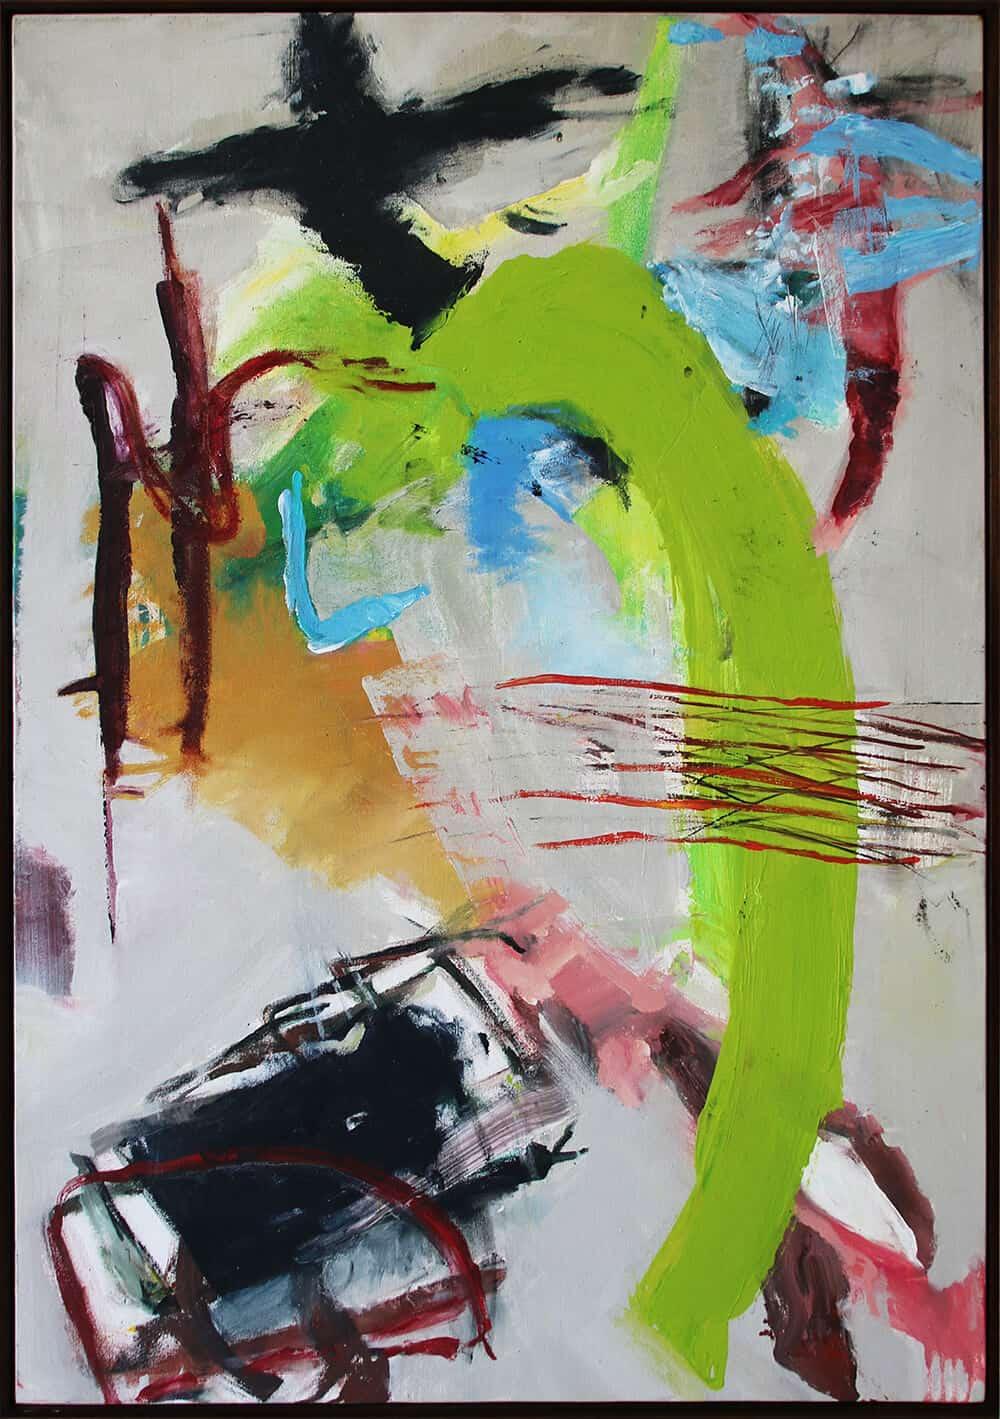 Karatara: Ambient Composition, 2019. Acrylic on canvas, 82.5 x 117.5cm.